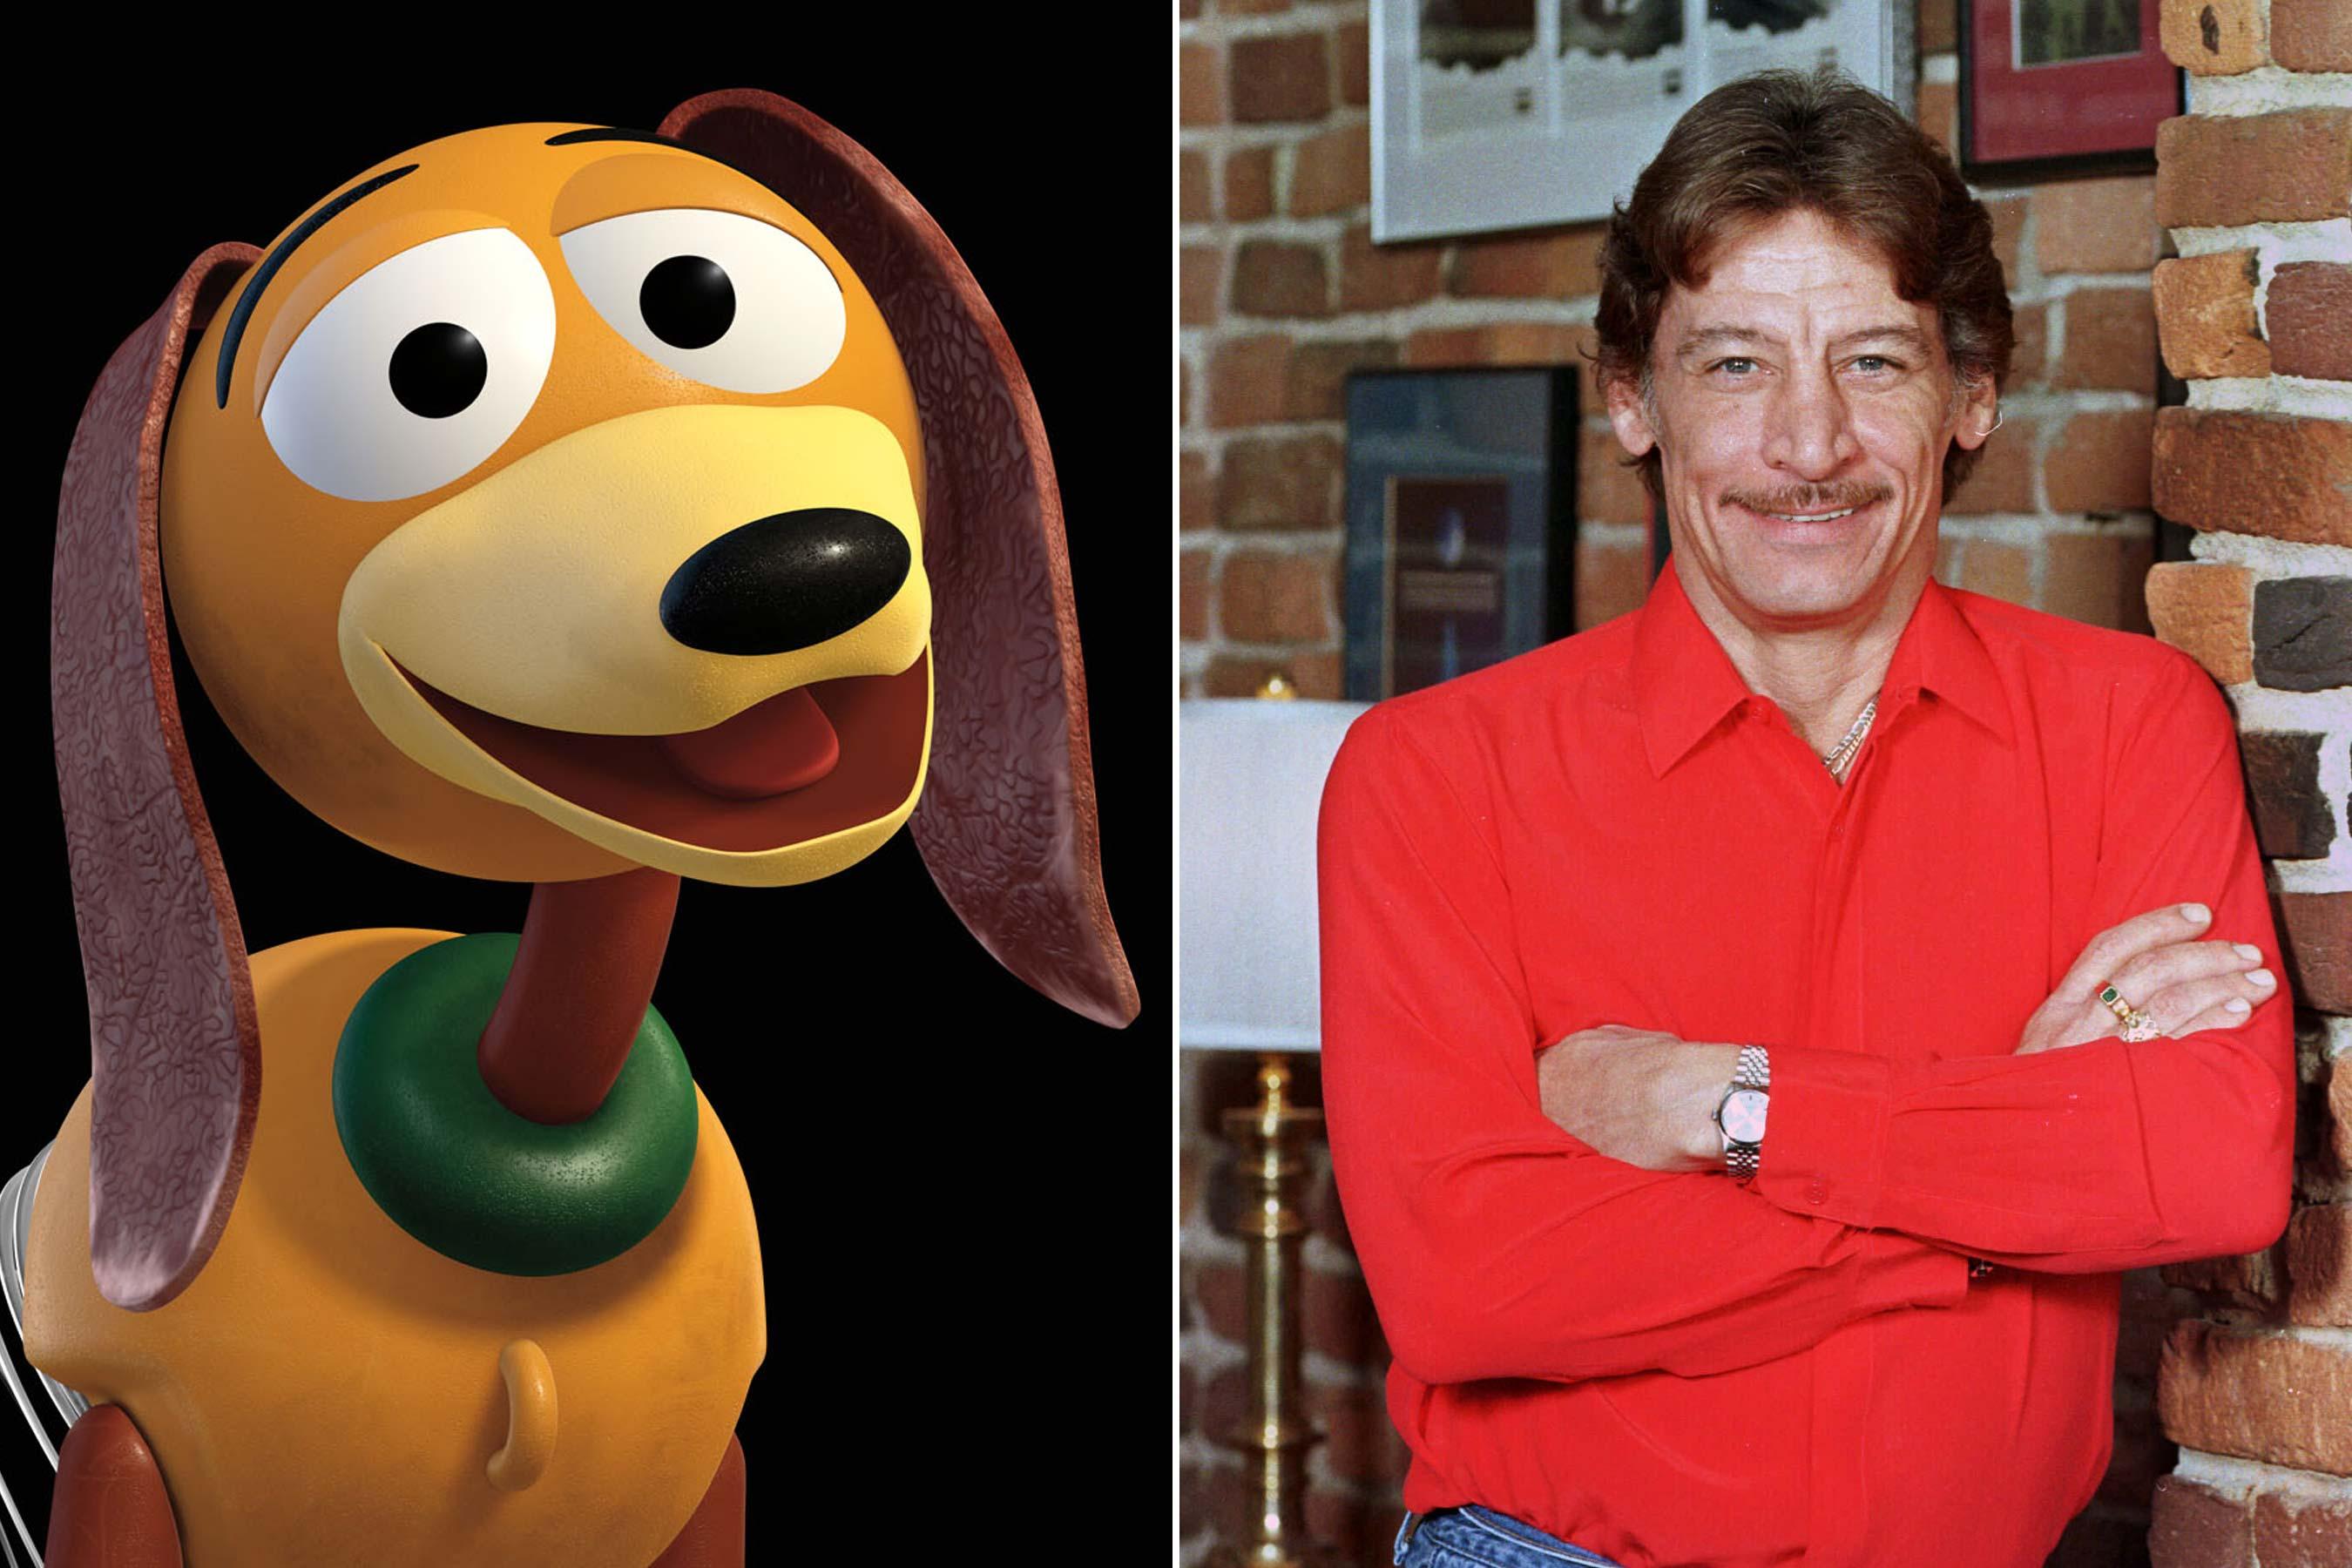 <strong>Slinky Dog - Jim Varney (Toy Story 1-2)</strong>